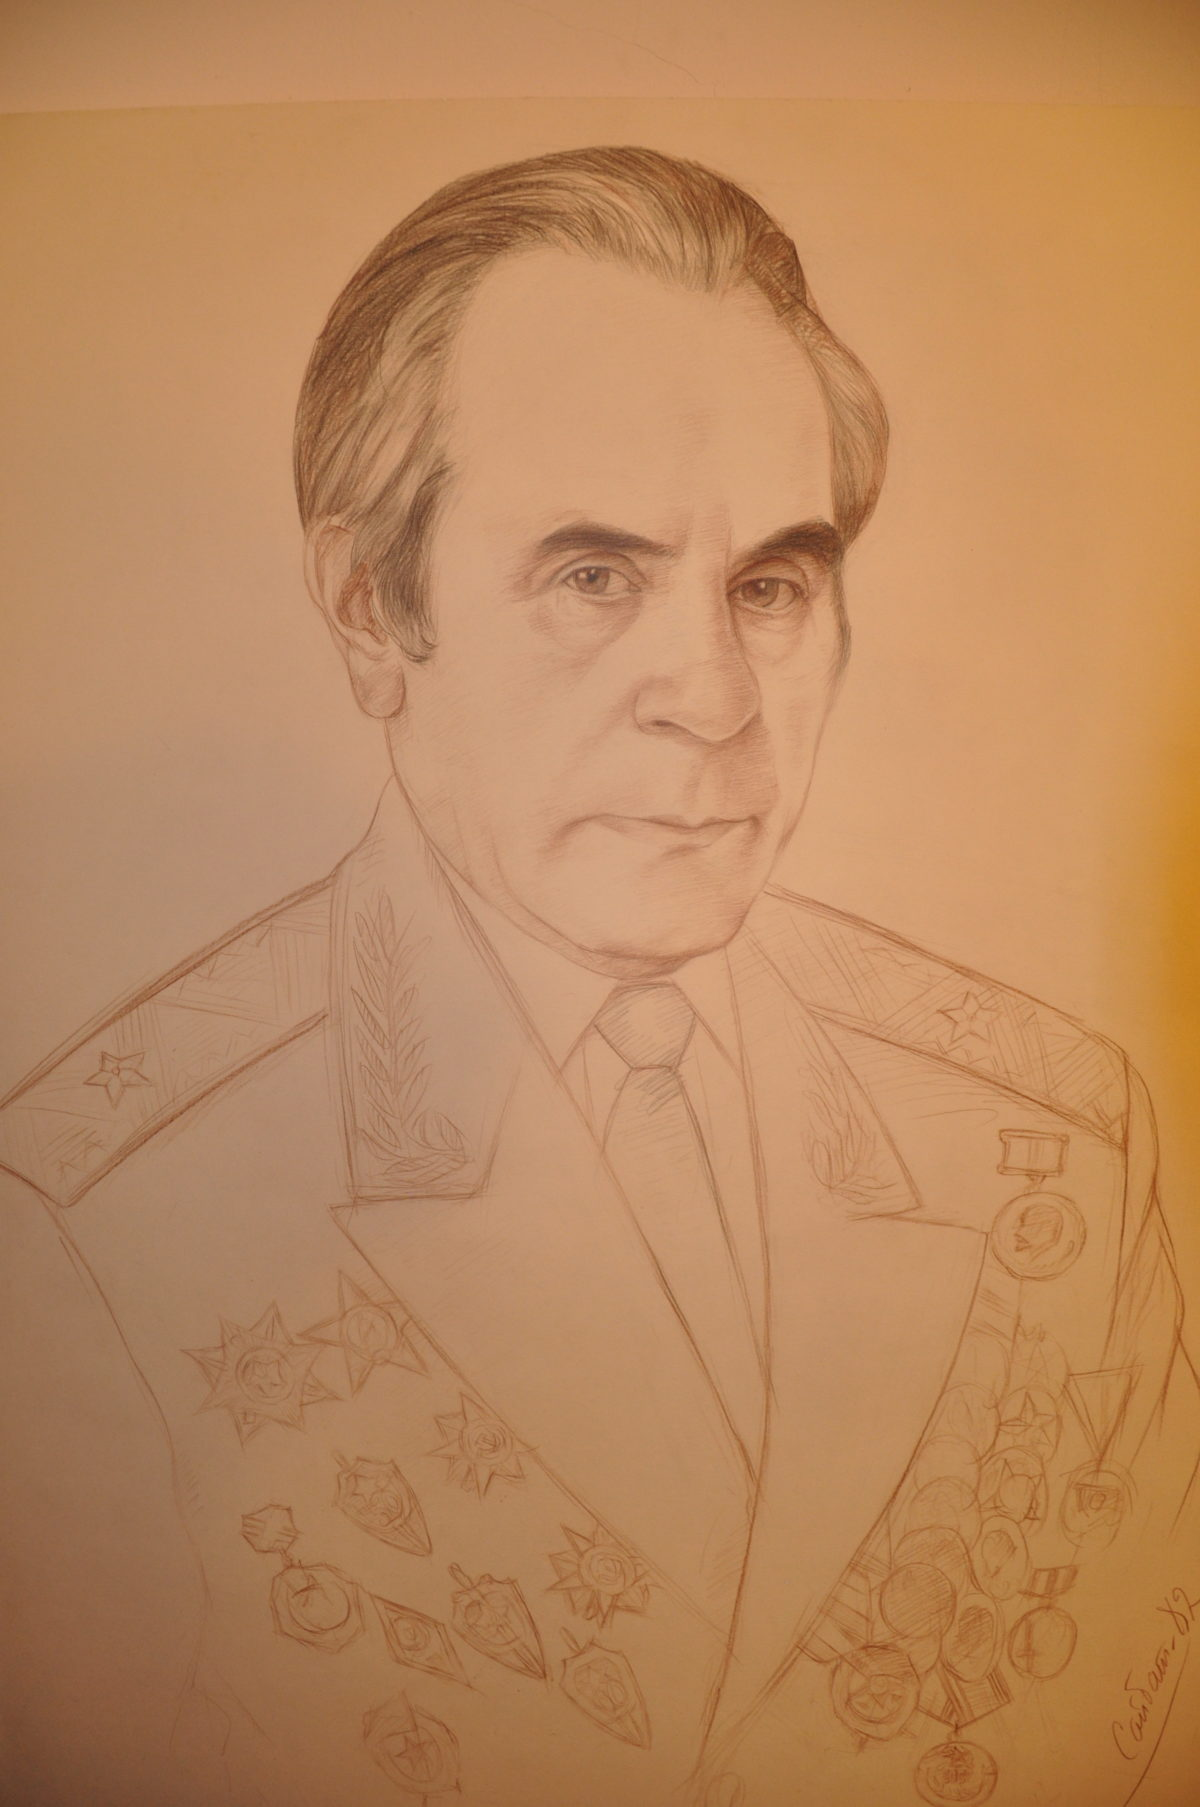 Принцев Сергей Петрович